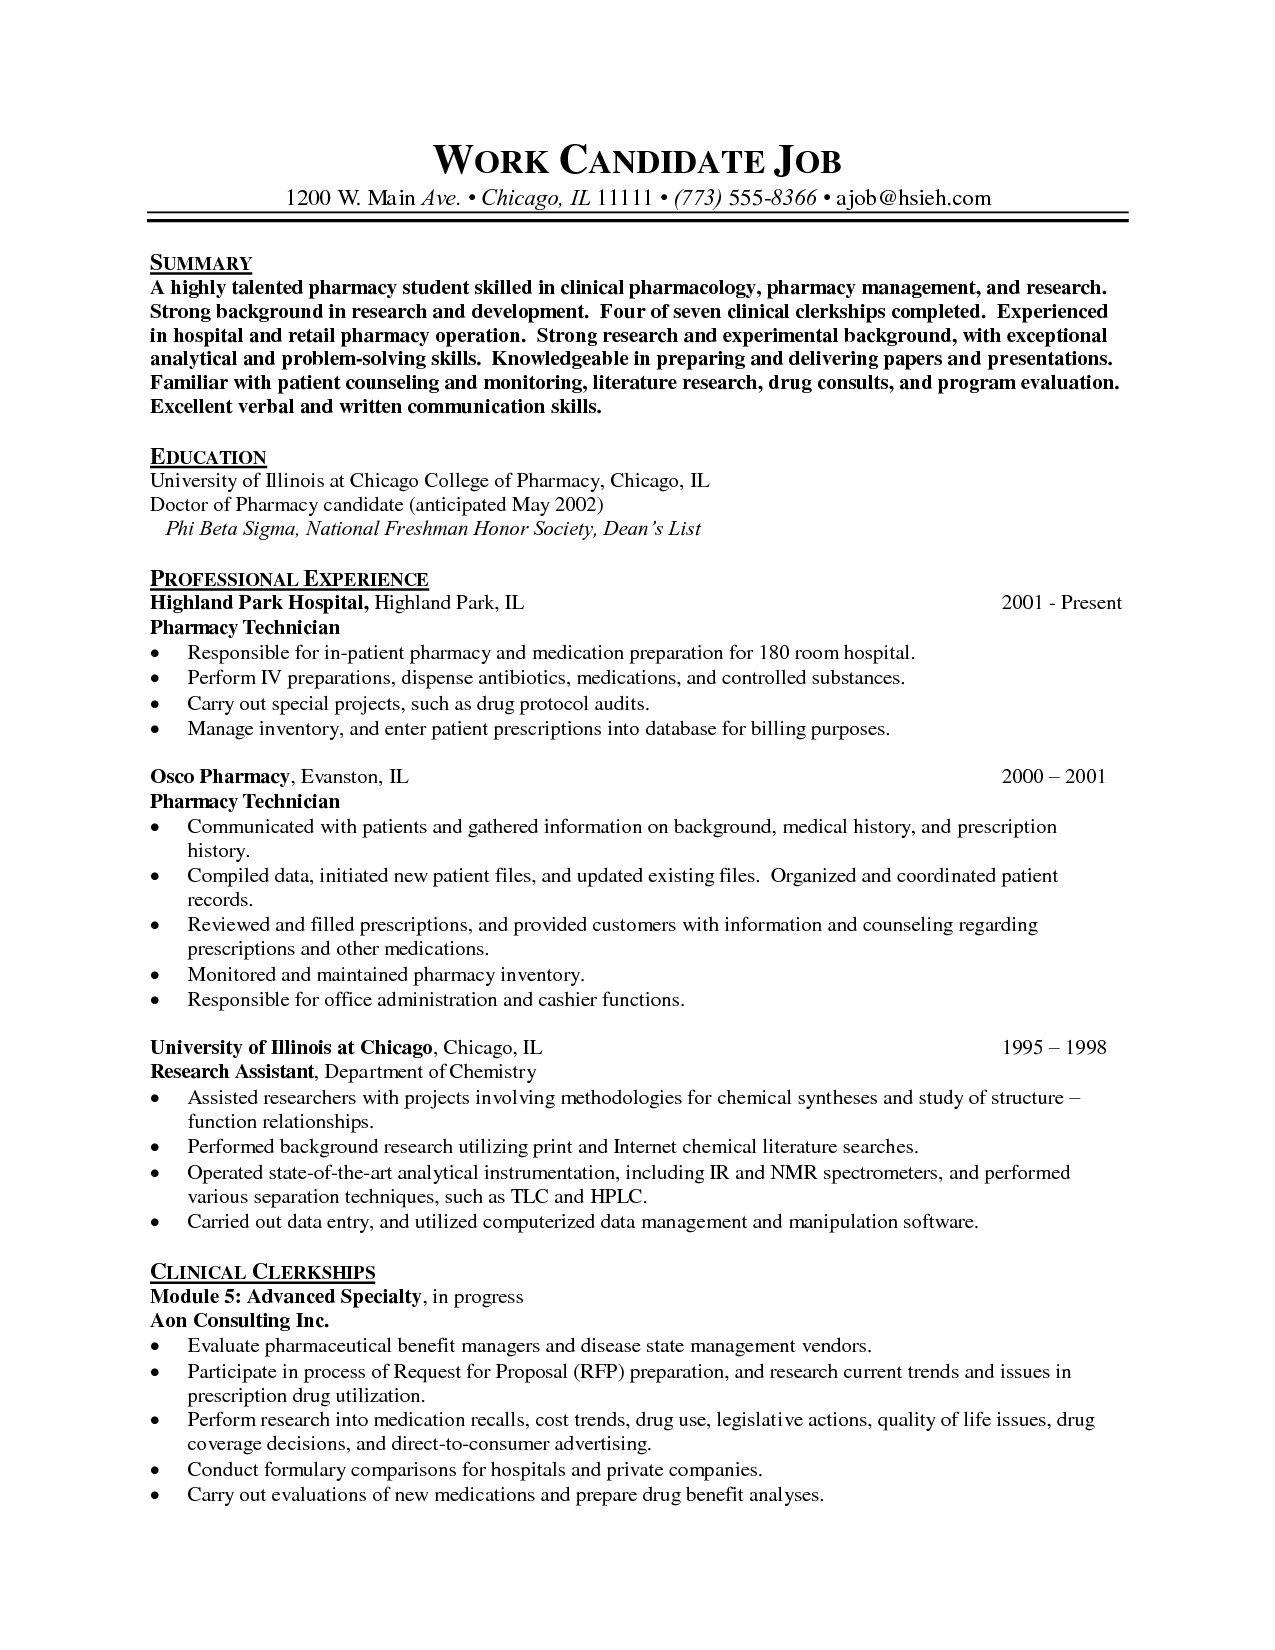 Pharmacy Technician Resume Objectives Original Pharmacy Technician Resume Skills Of 40 Incred Pharmacy Technician Resume Skills Cover Letter For Resume